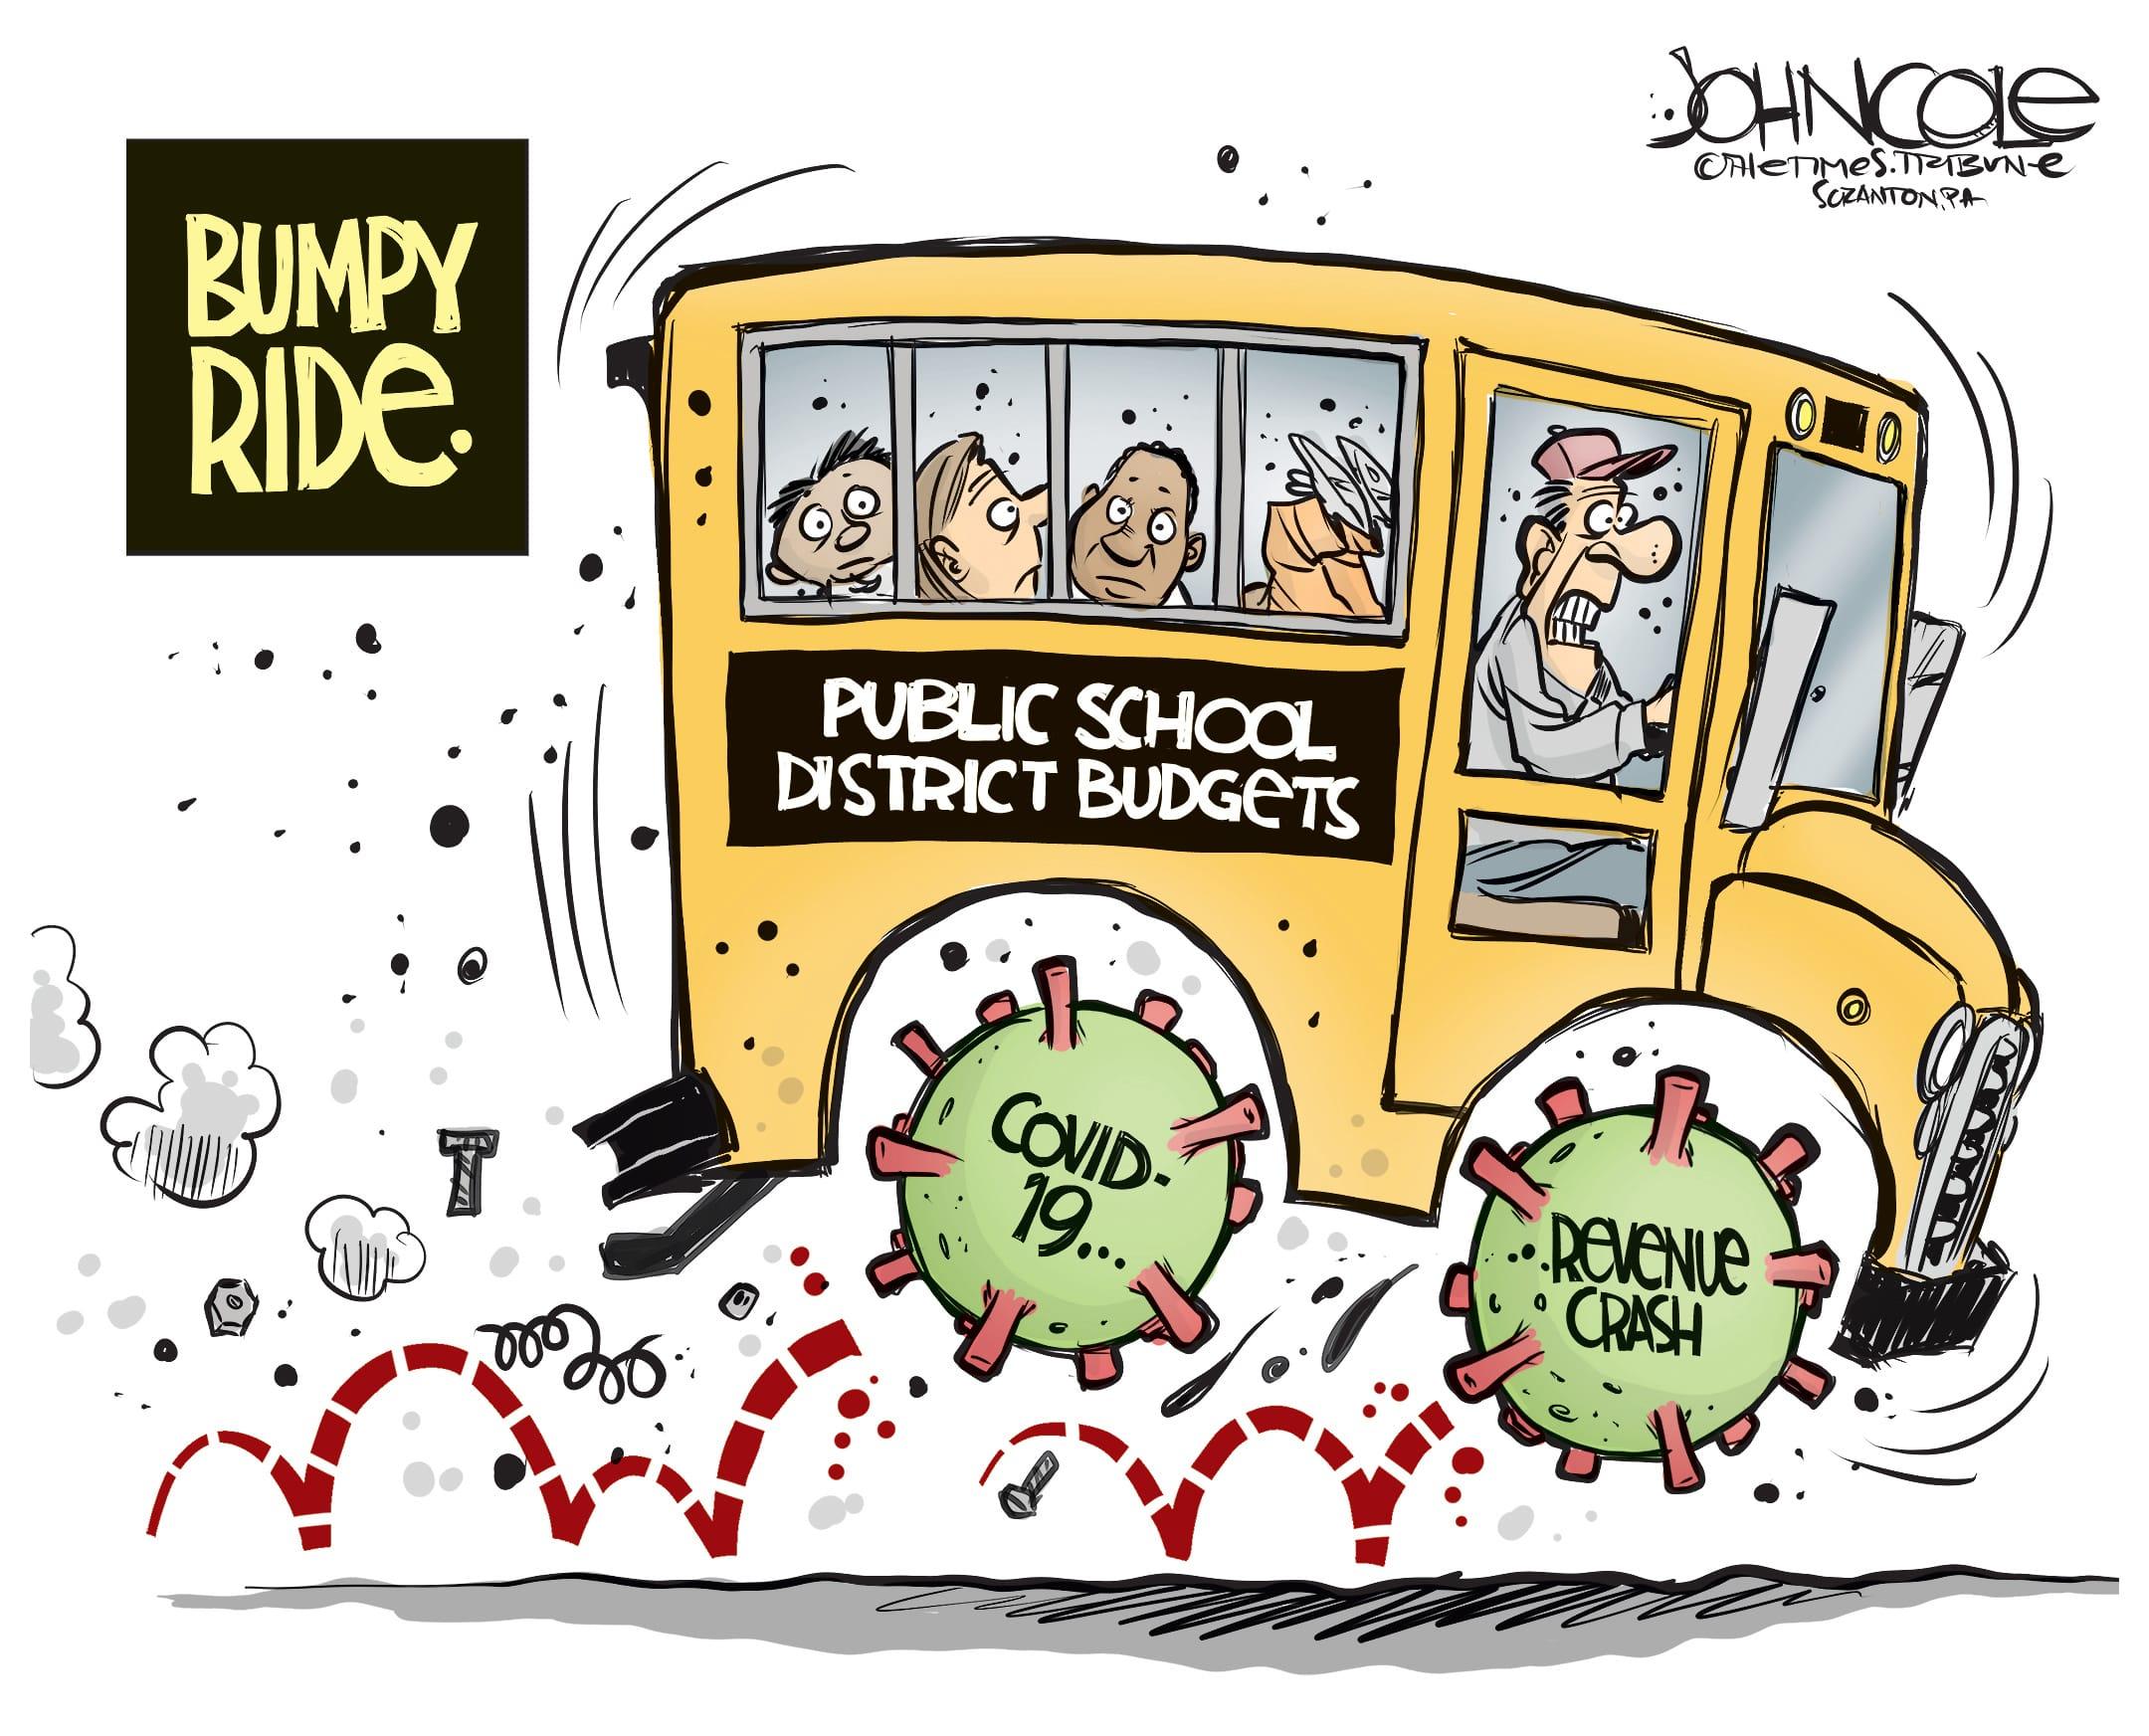 May 30: School Budgets